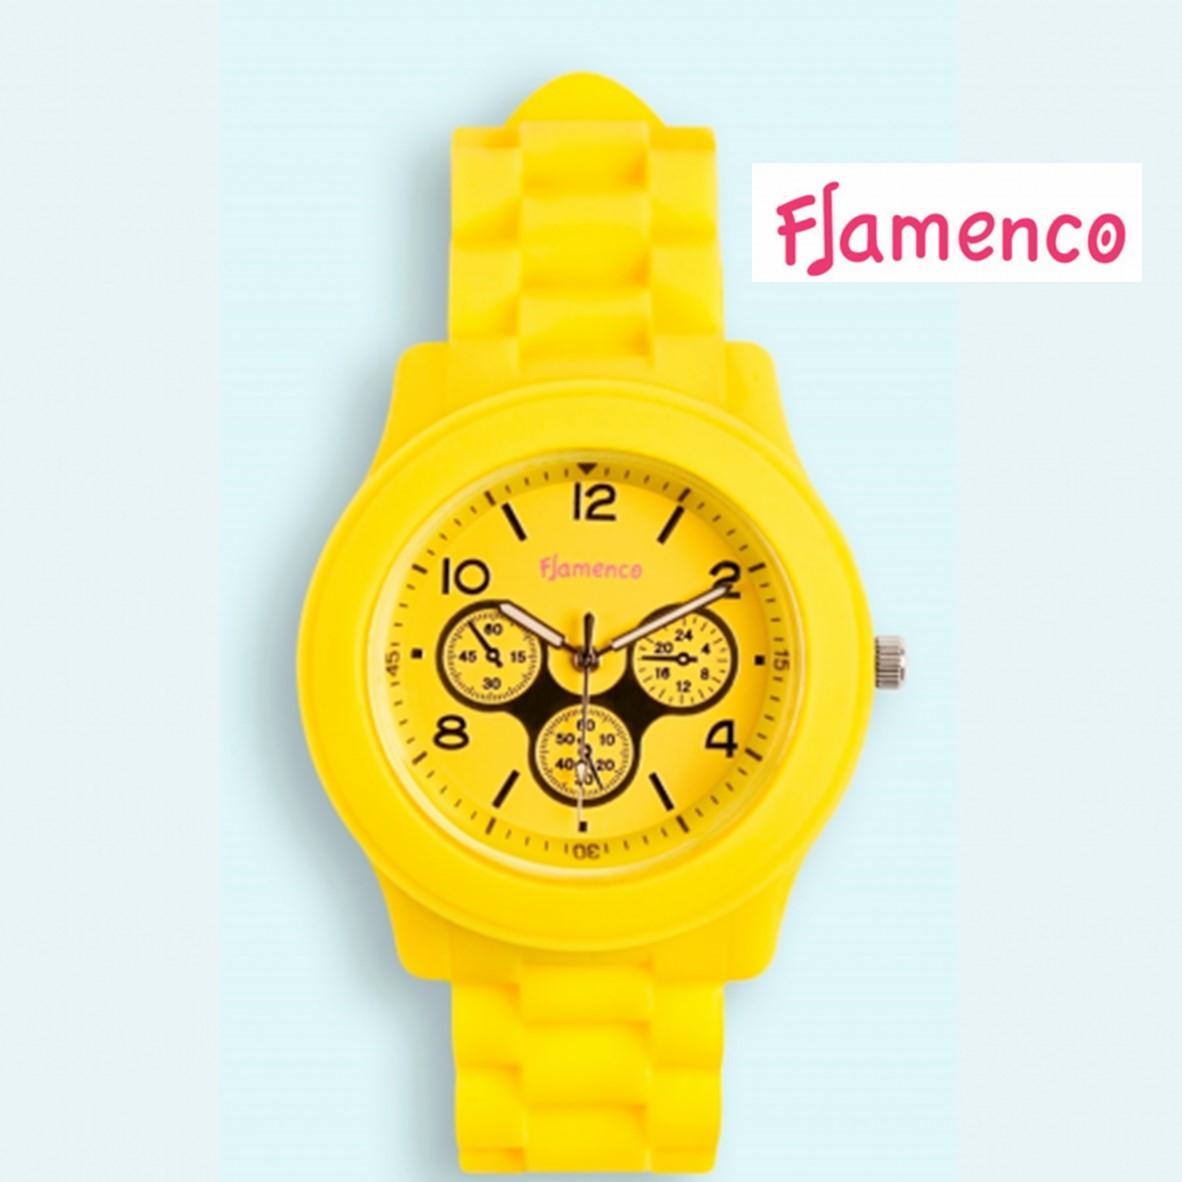 ec54cdee8241 Reloj Flamenco Amarillo Sumergible